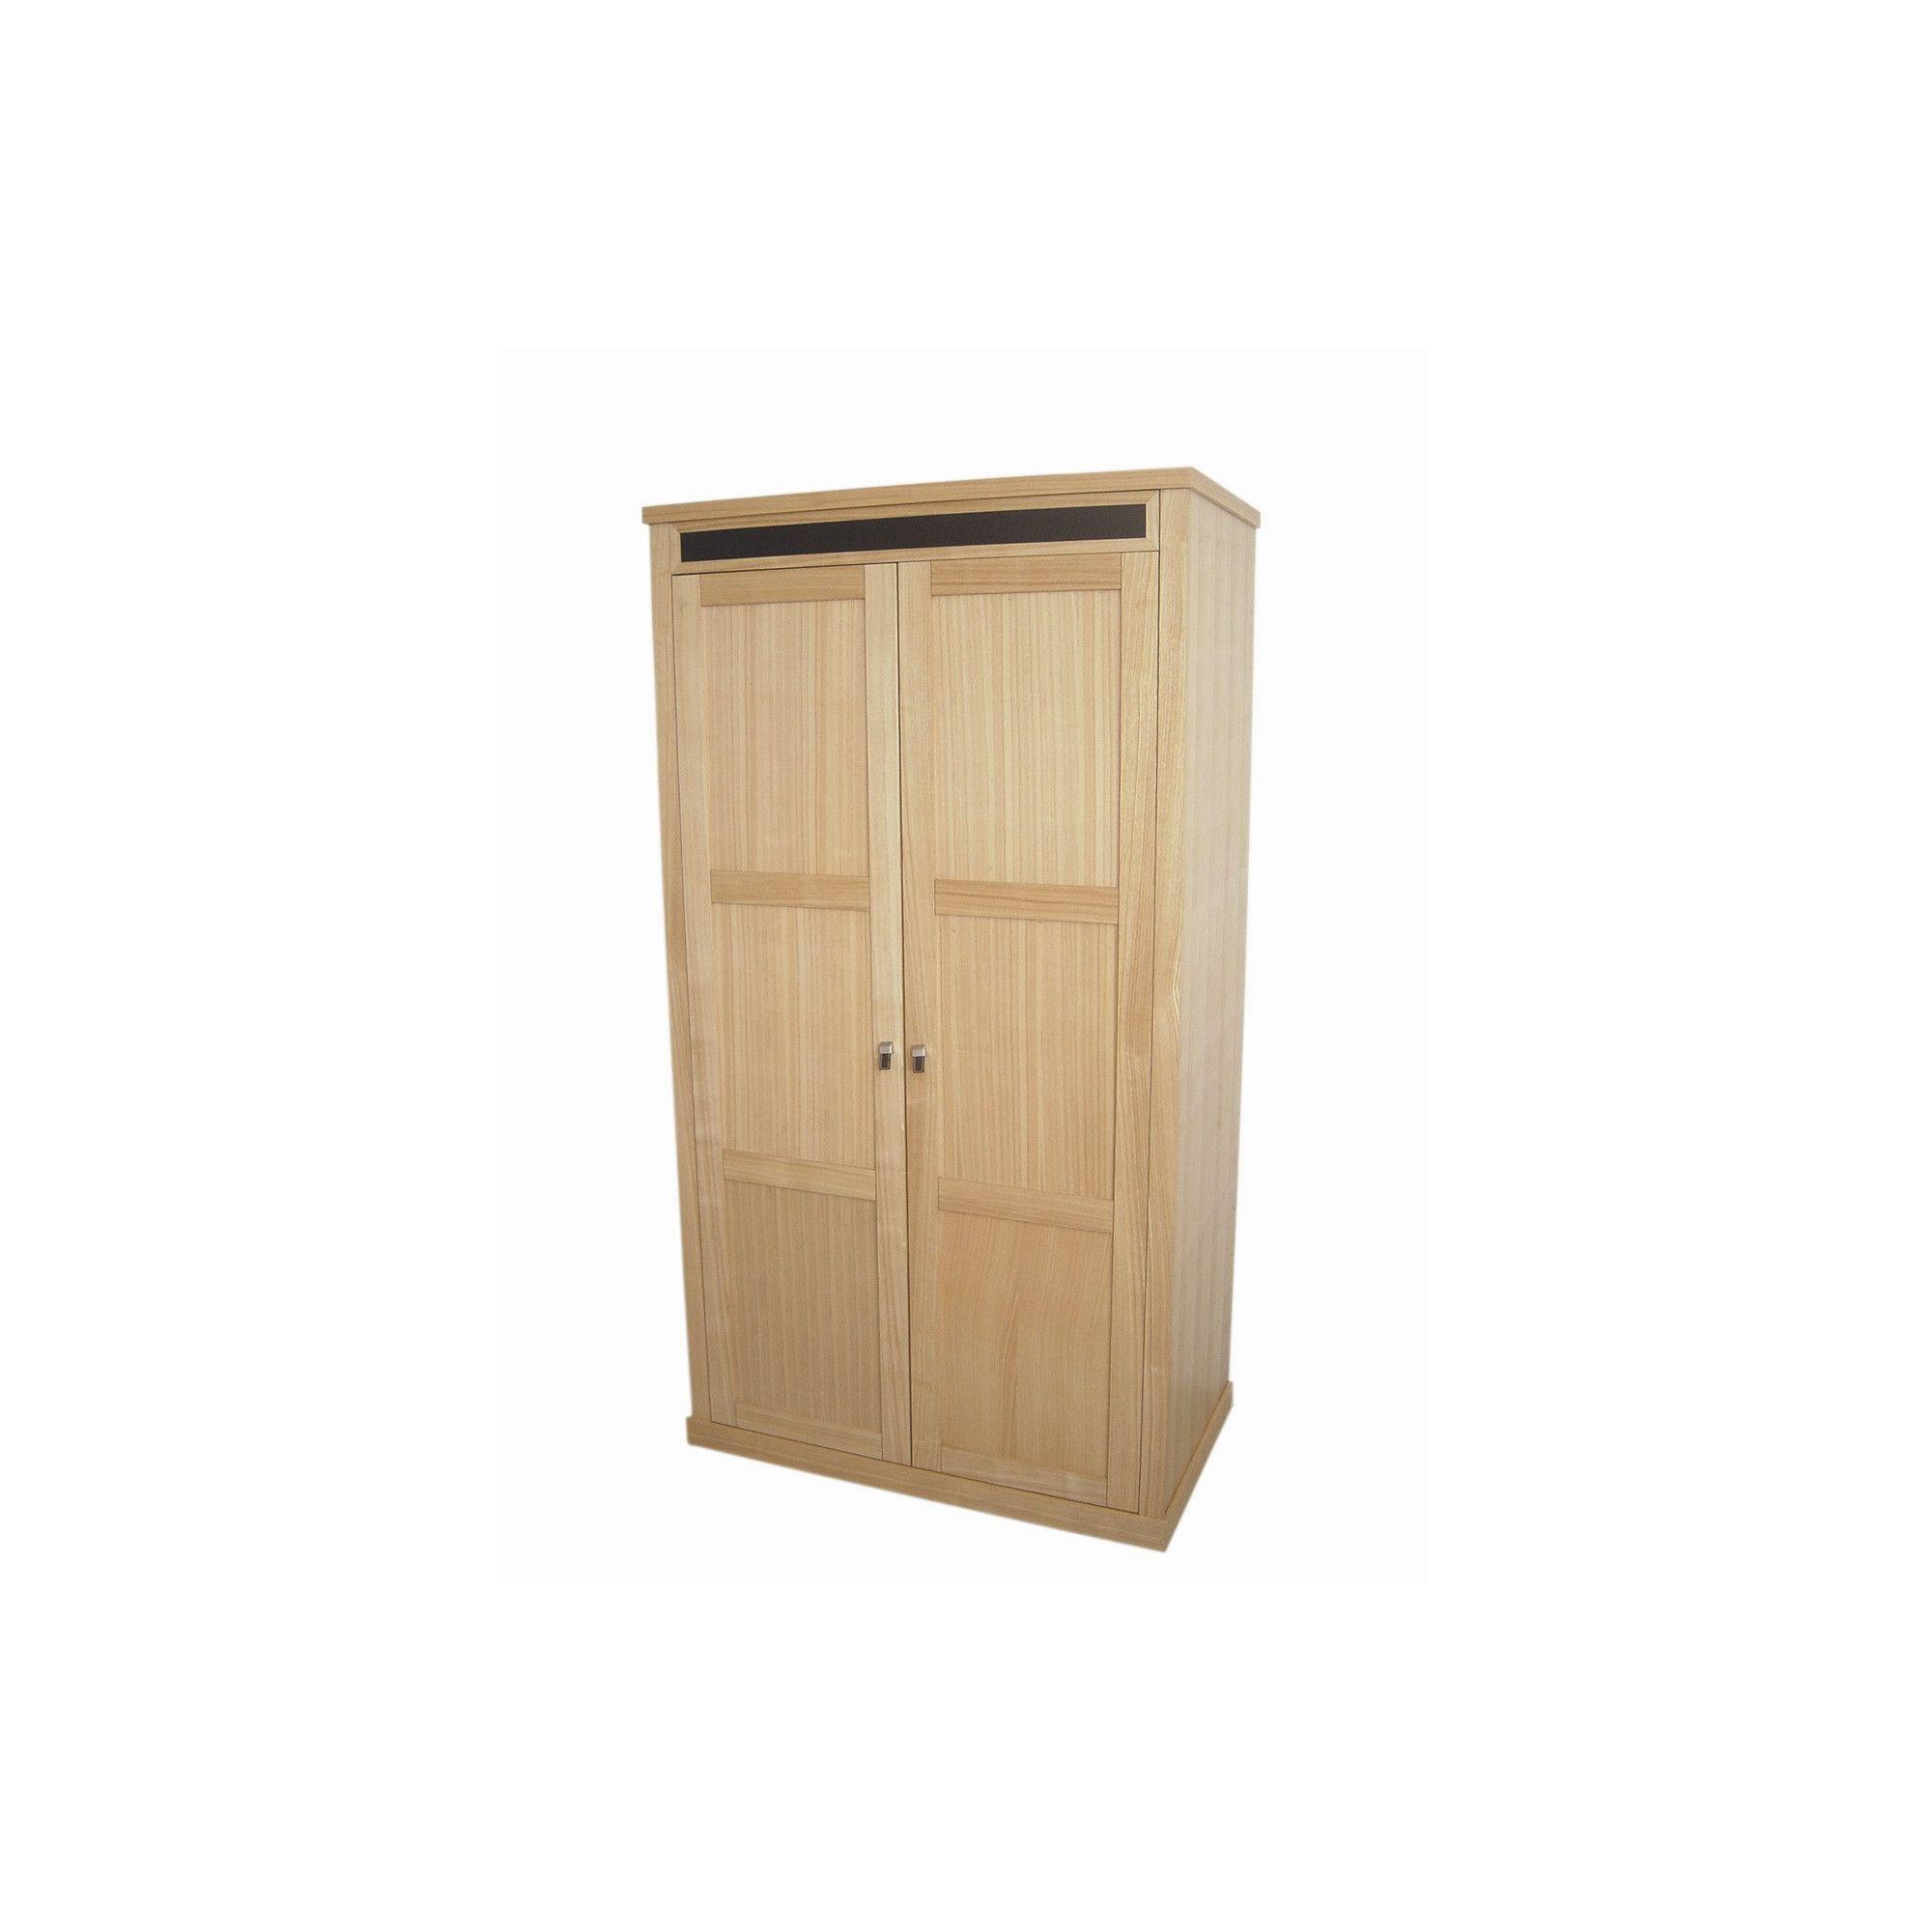 Home Zone Chelsea Two Door Wardrobe in Oak at Tesco Direct